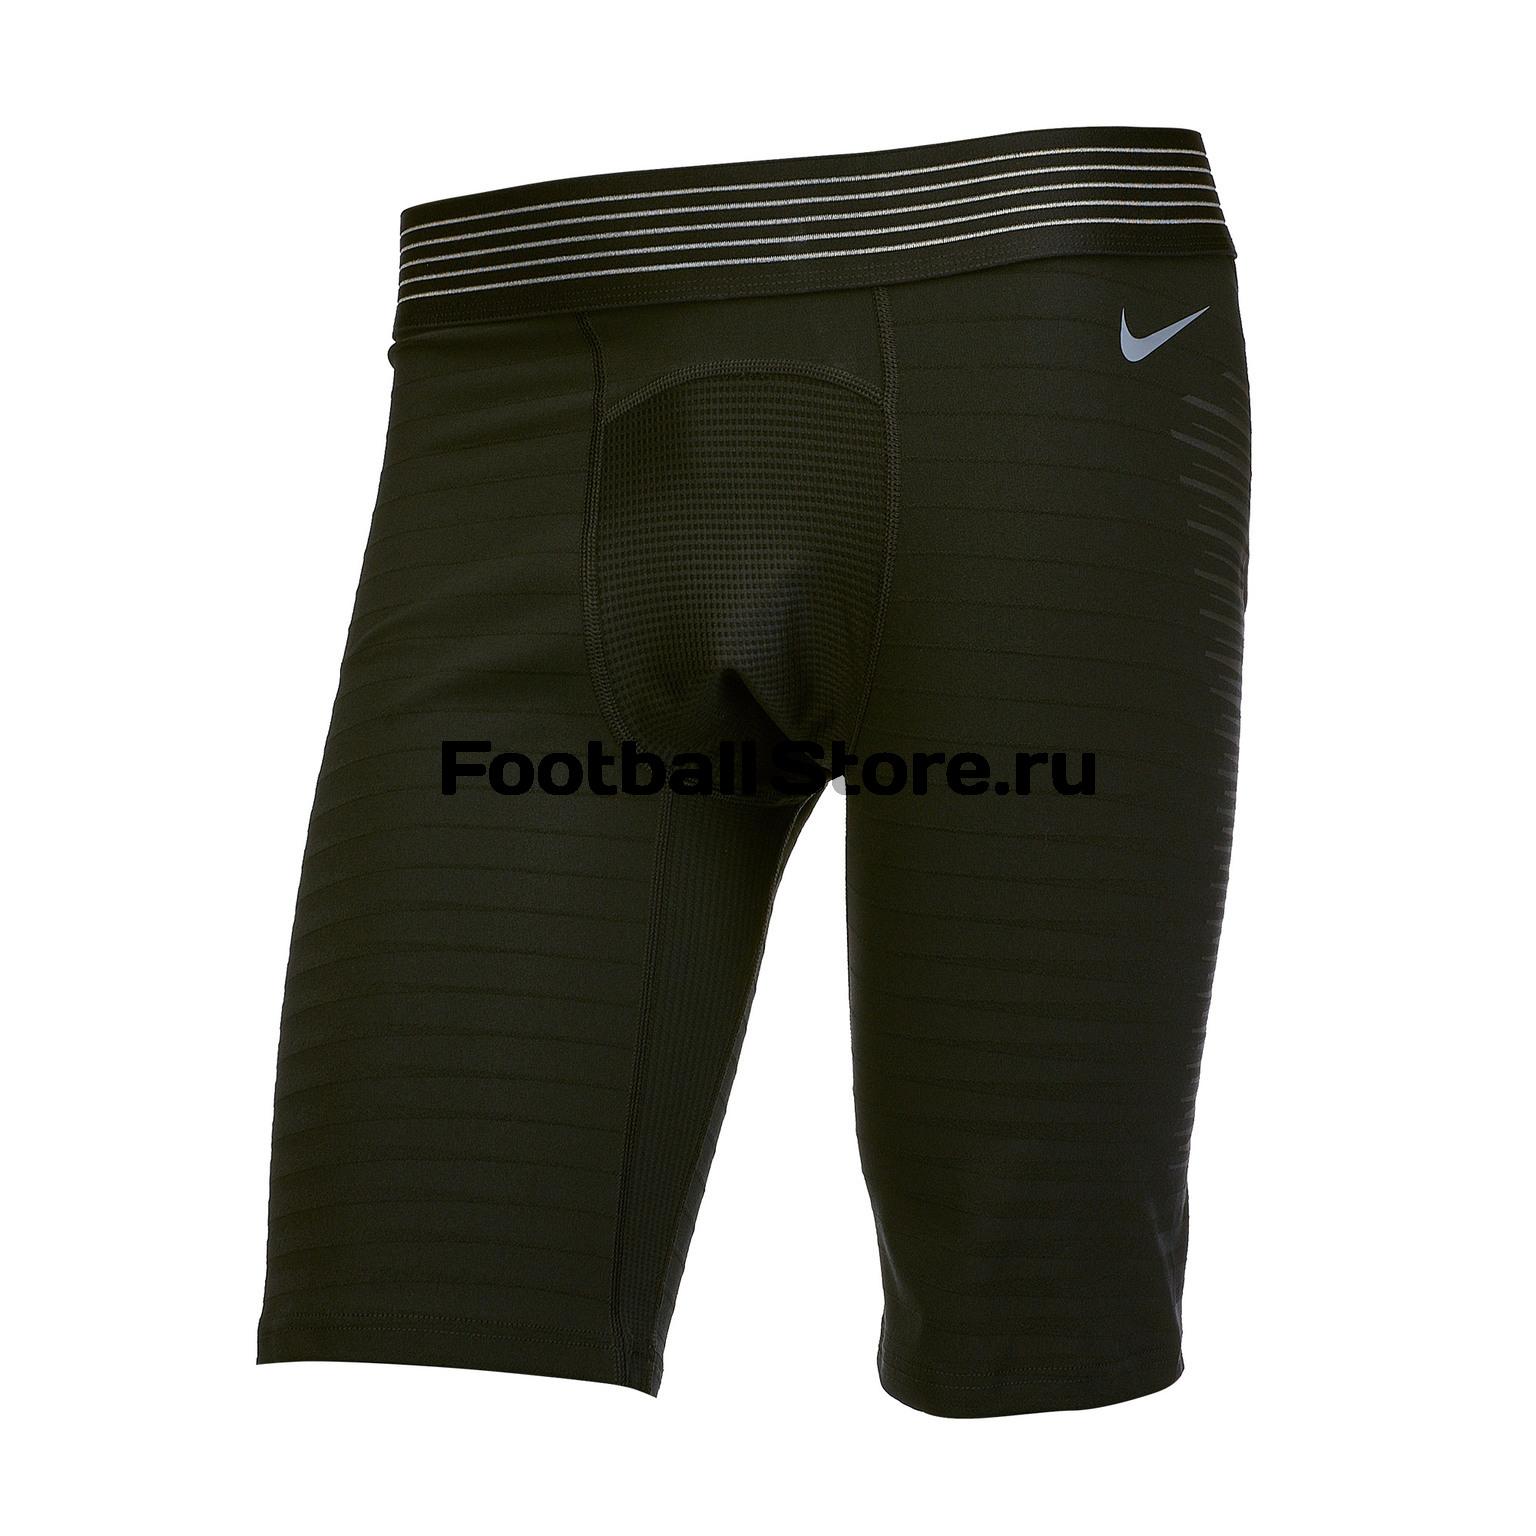 Белье шорты Nike GFA Slider 923085-010 одежда для гольфа nike 639790 101 010 089 639790